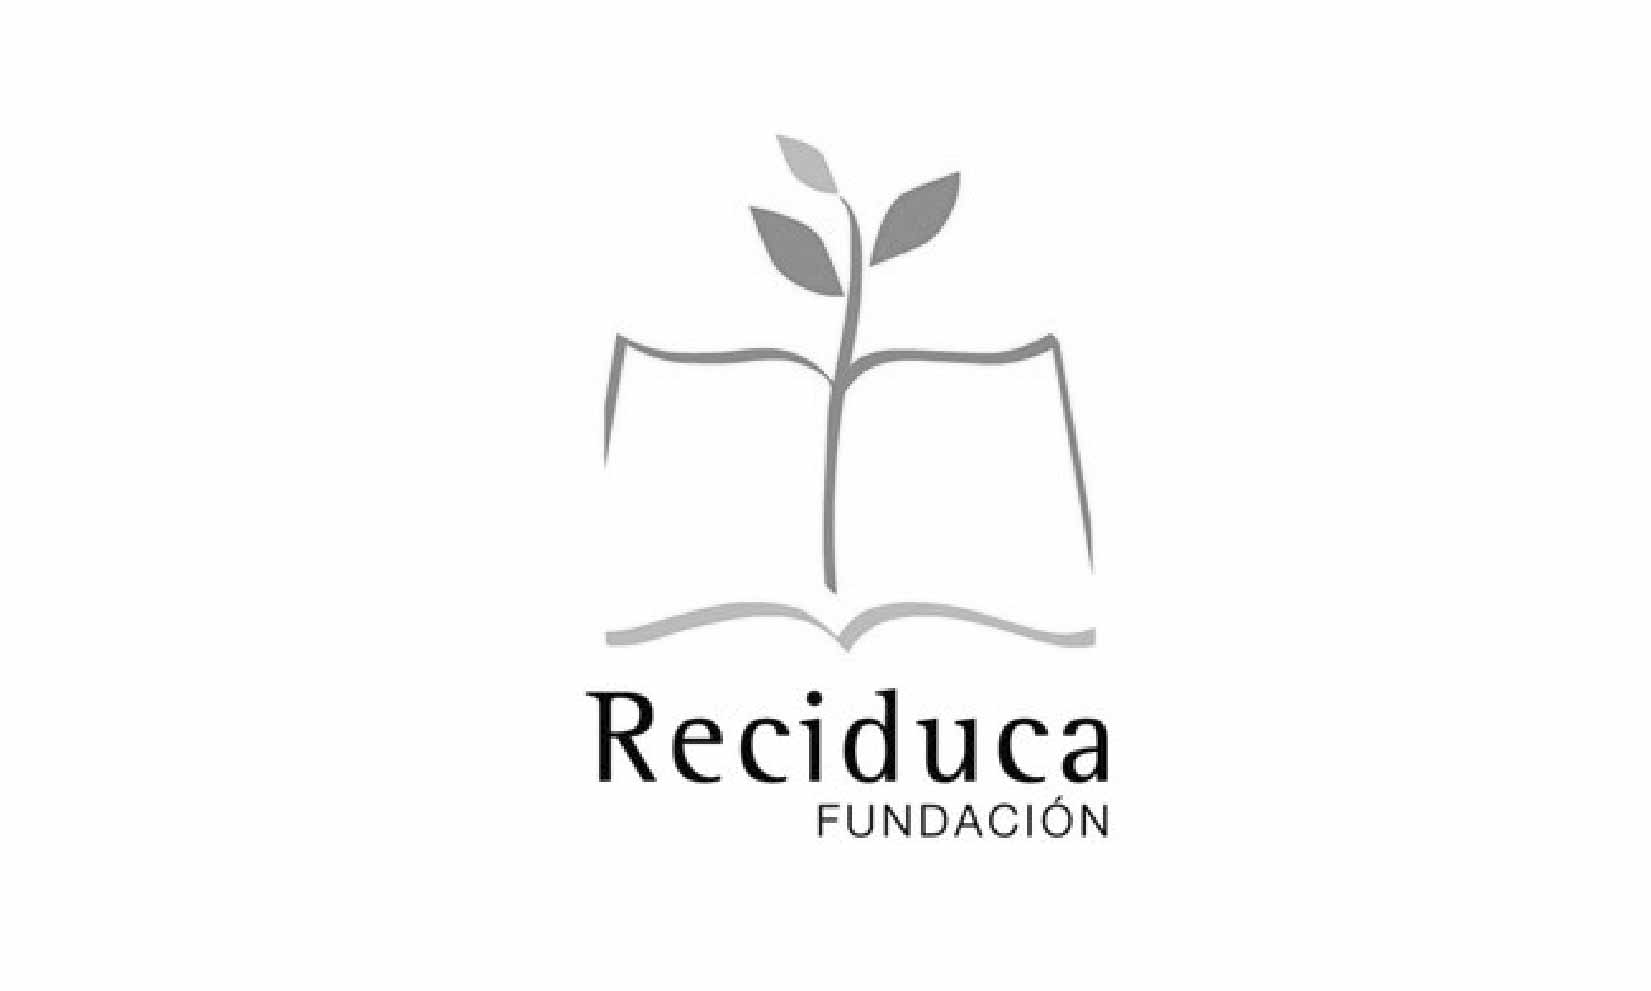 RECIDUCA-09